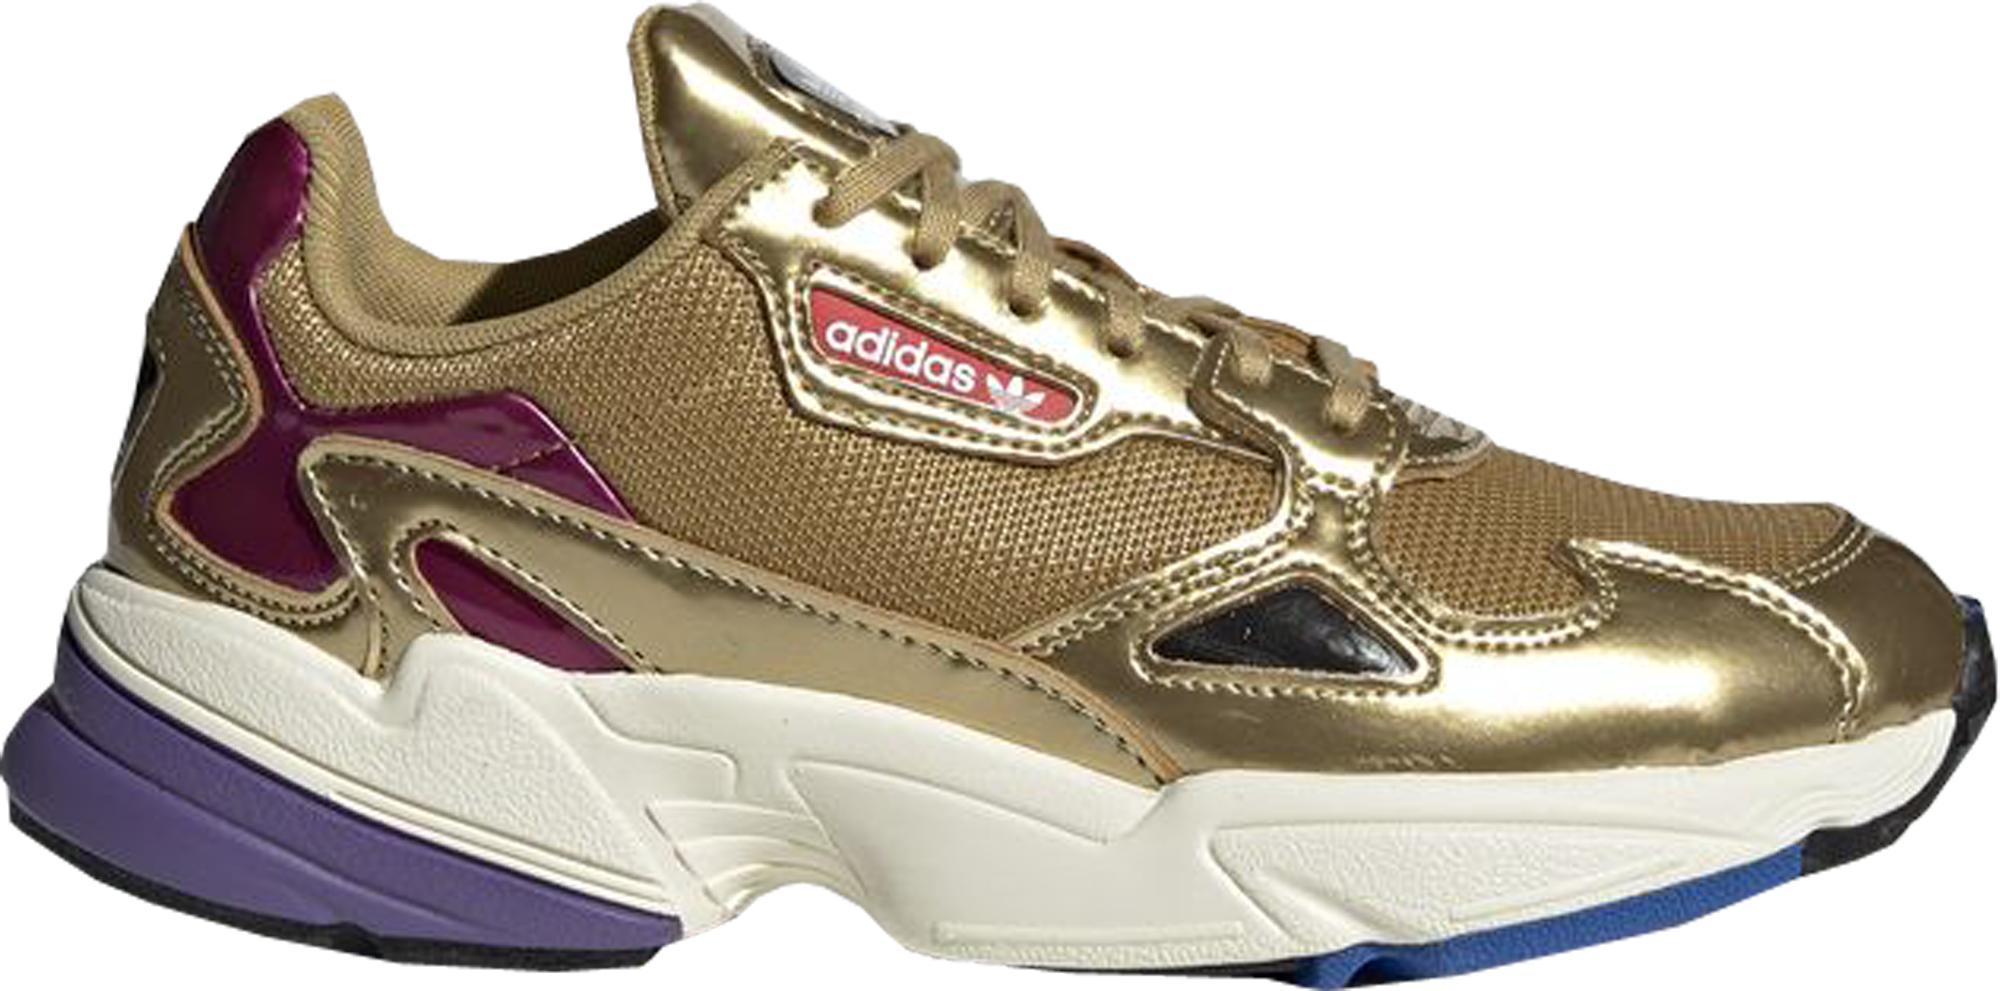 adidas Falcon Gold Metallic (W) - CG6247